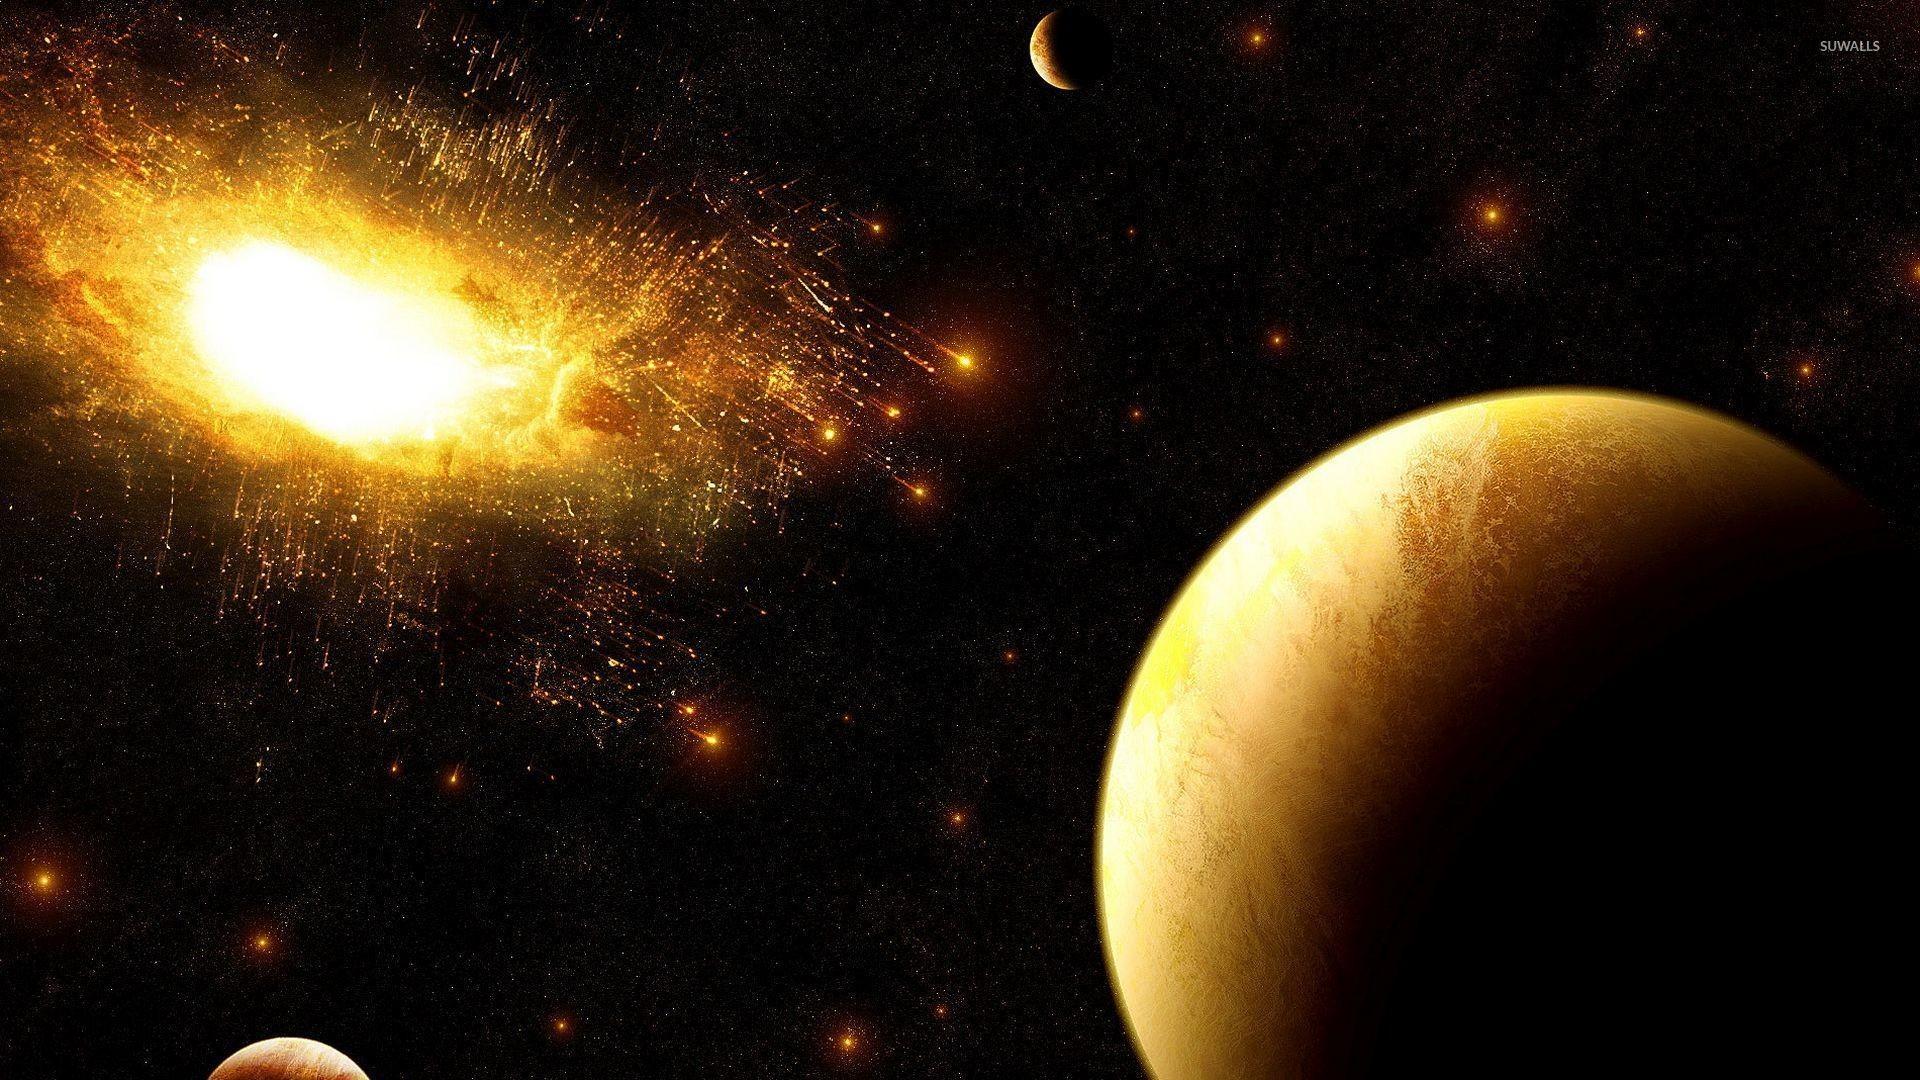 Golden explosion in the dark space wallpaper jpg